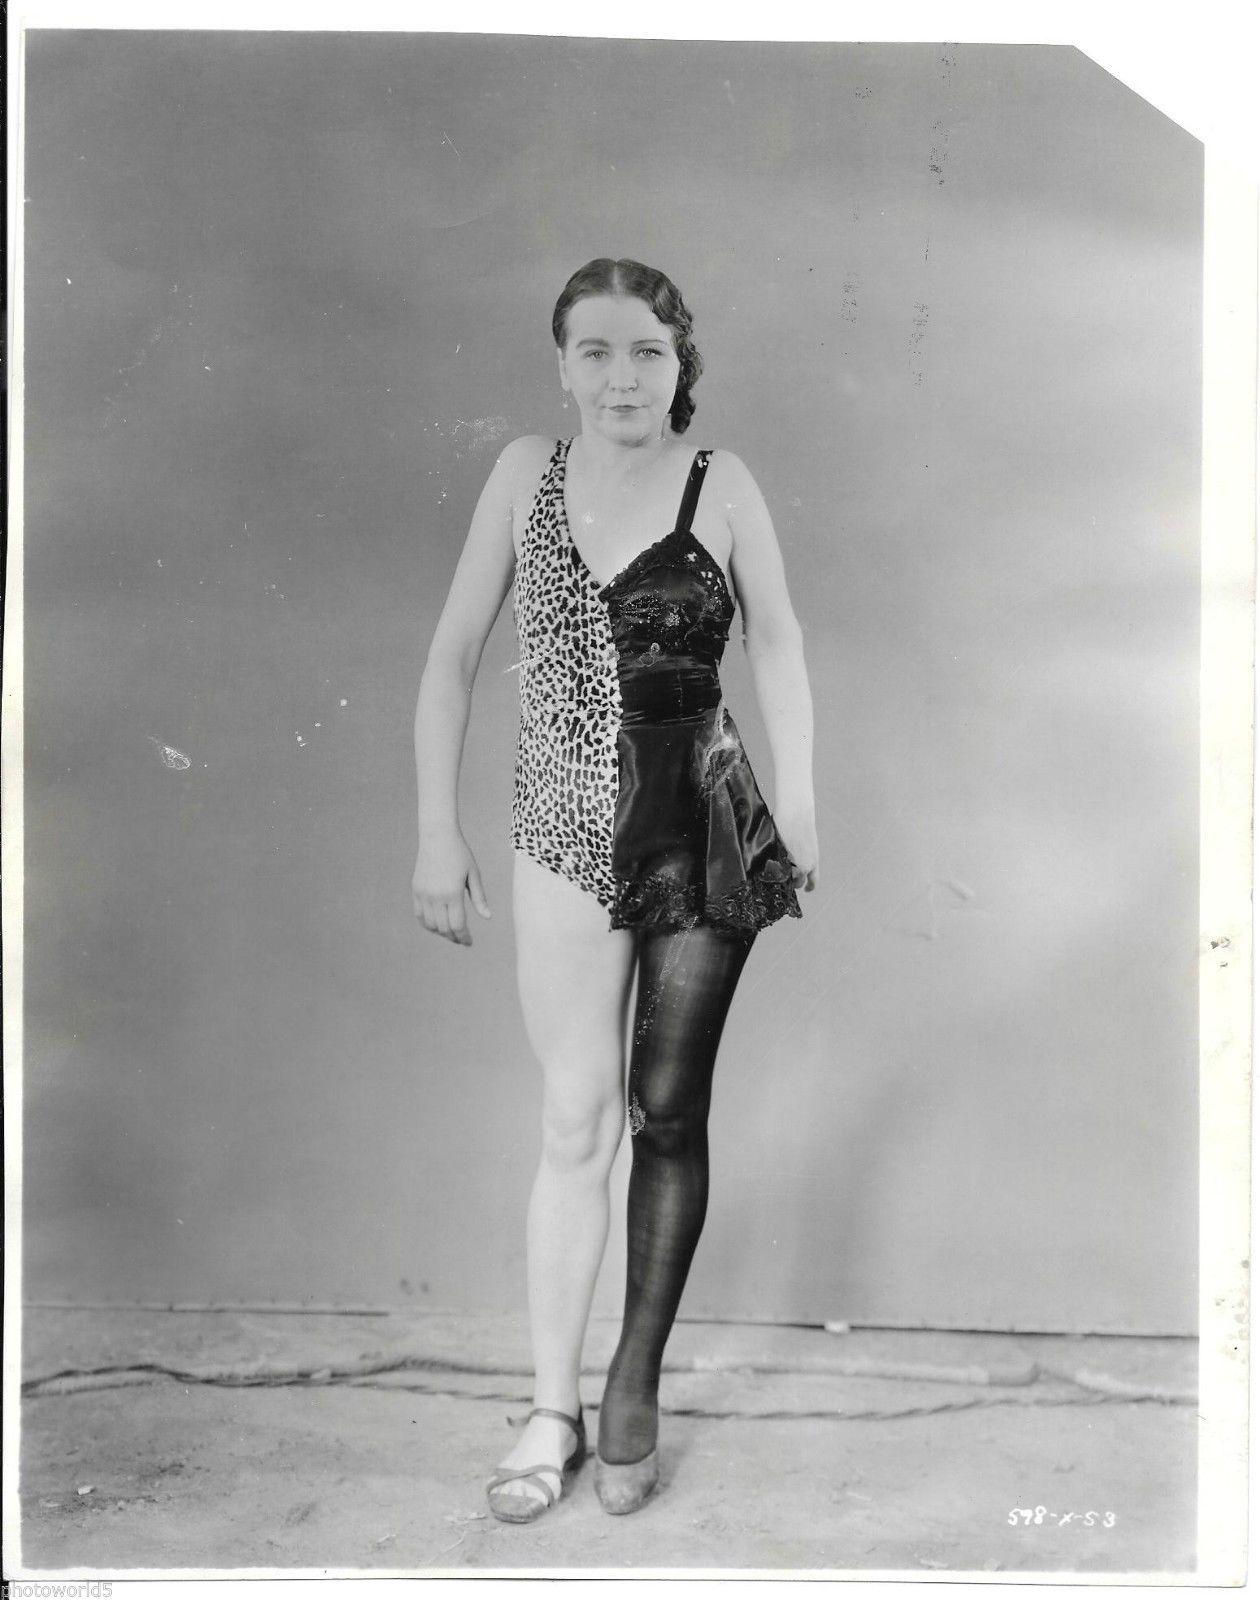 Half Man Half Woman Circus Performer Josephine Joseph Joseph Needed